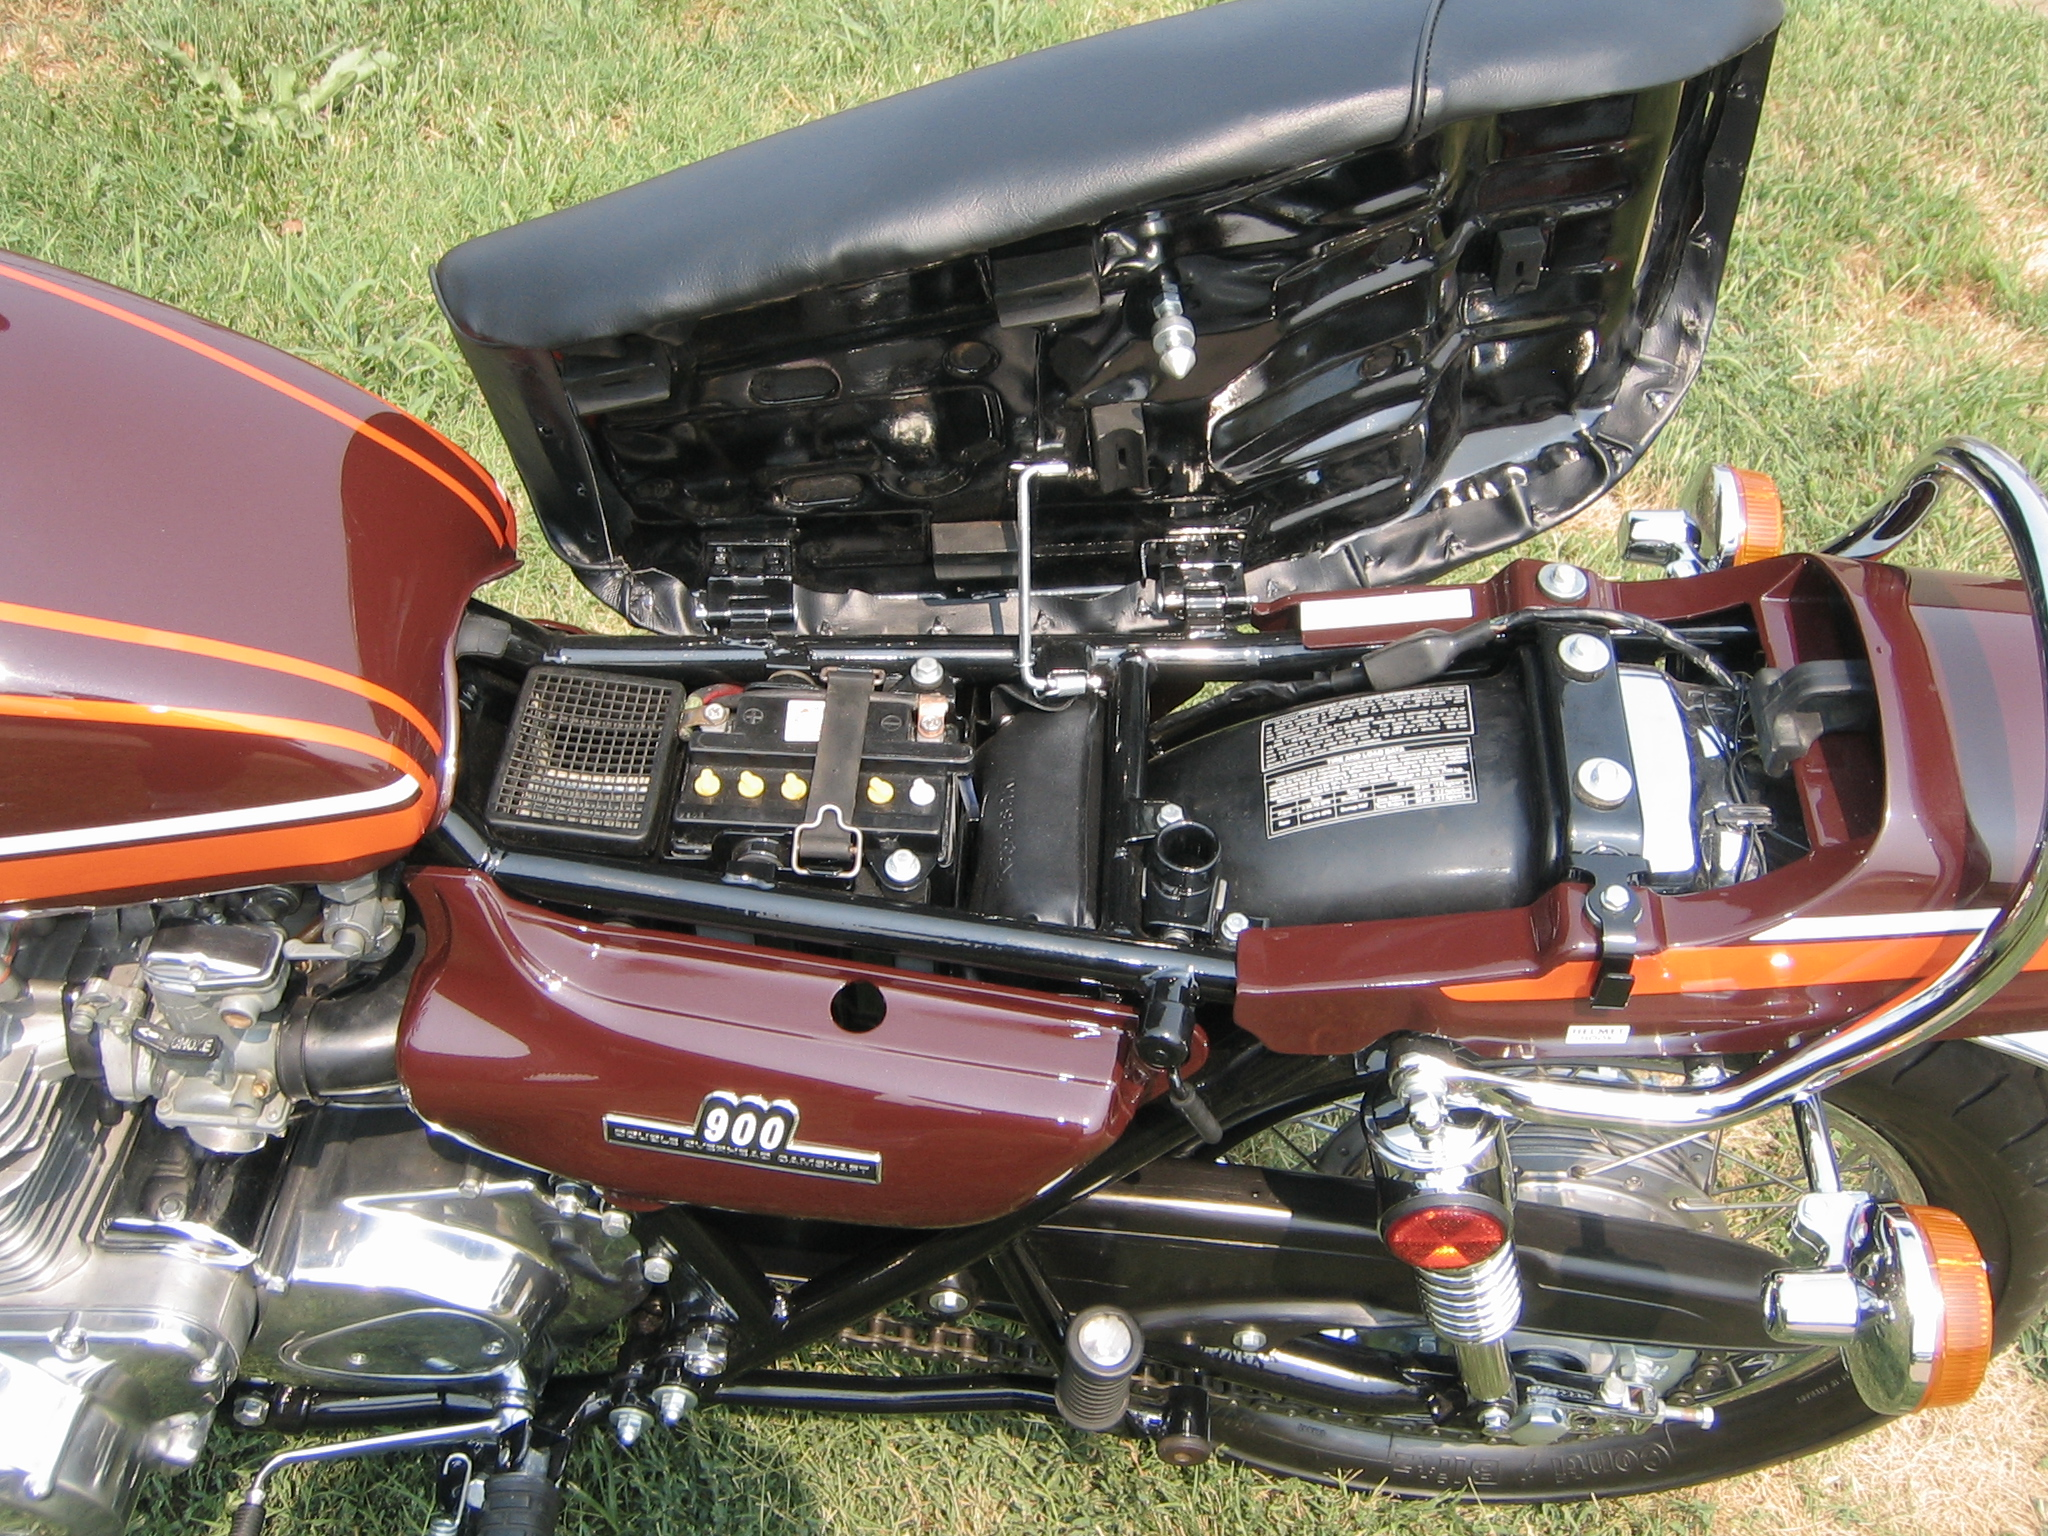 1982 wiring honda diagram nighthawk cb750 1982 honda magna